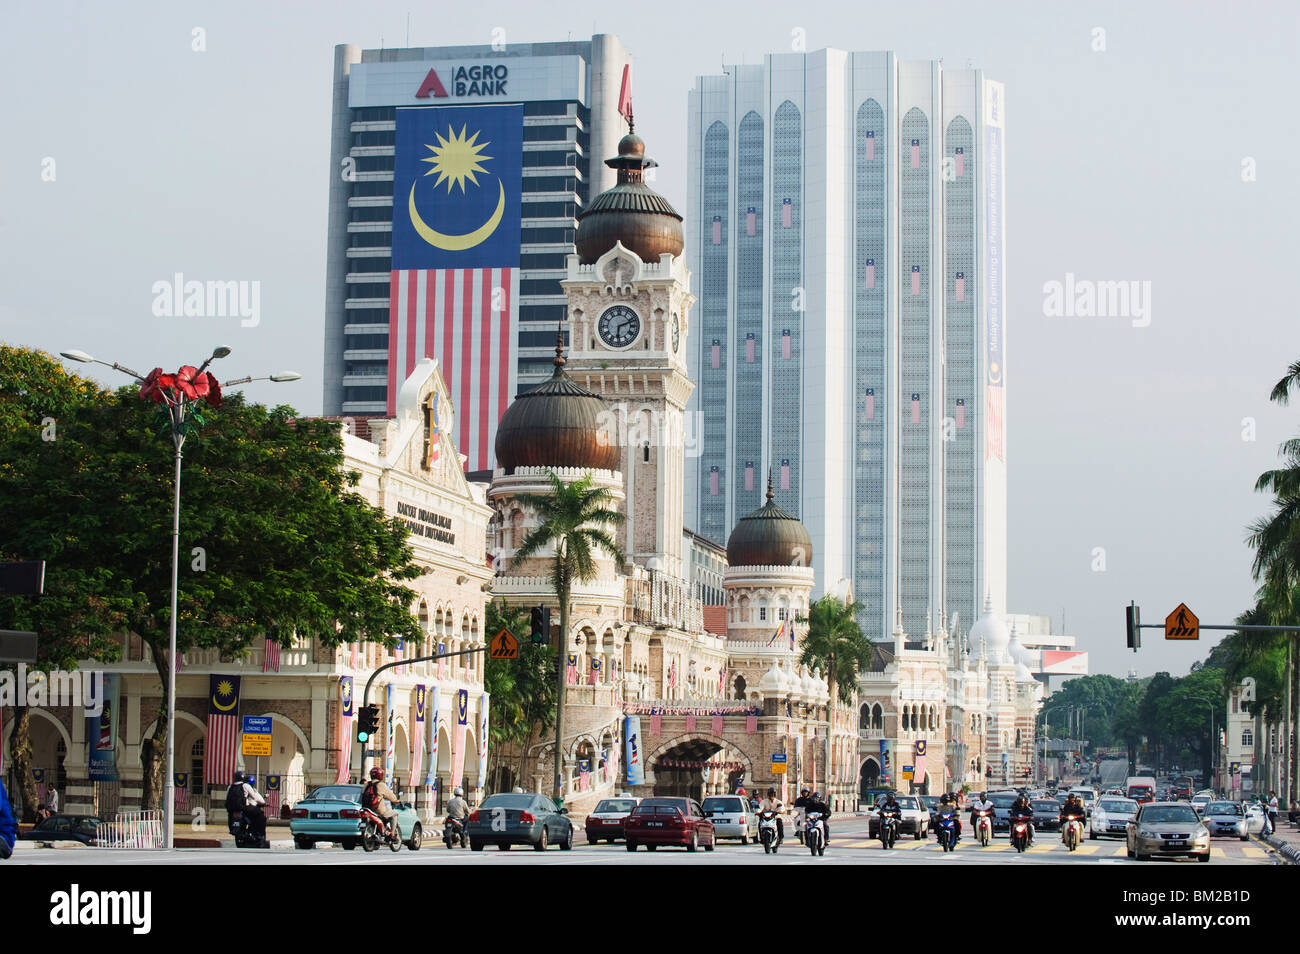 Sultan Abdul Samad Building and Dayabumi complex, Merdeka Square, Kuala Lumpur, Malaysia, Southeast Asia - Stock Image